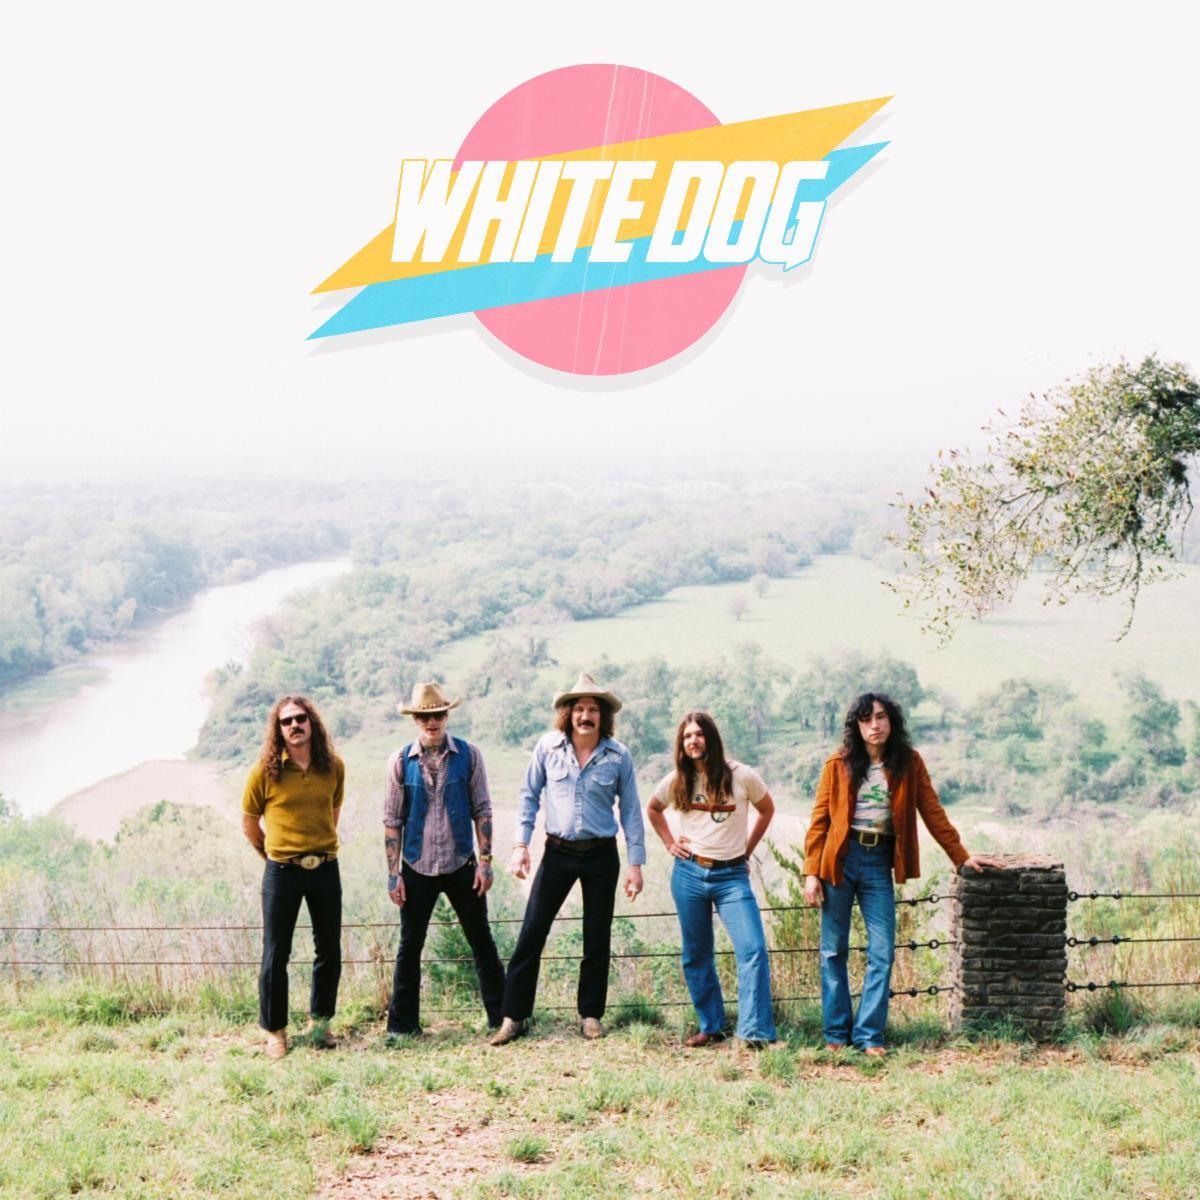 White Dog - White Dog (2020) Blues Psych hard rock 70 desde Texas. Más auténticos imposible. White-dog-white-dog